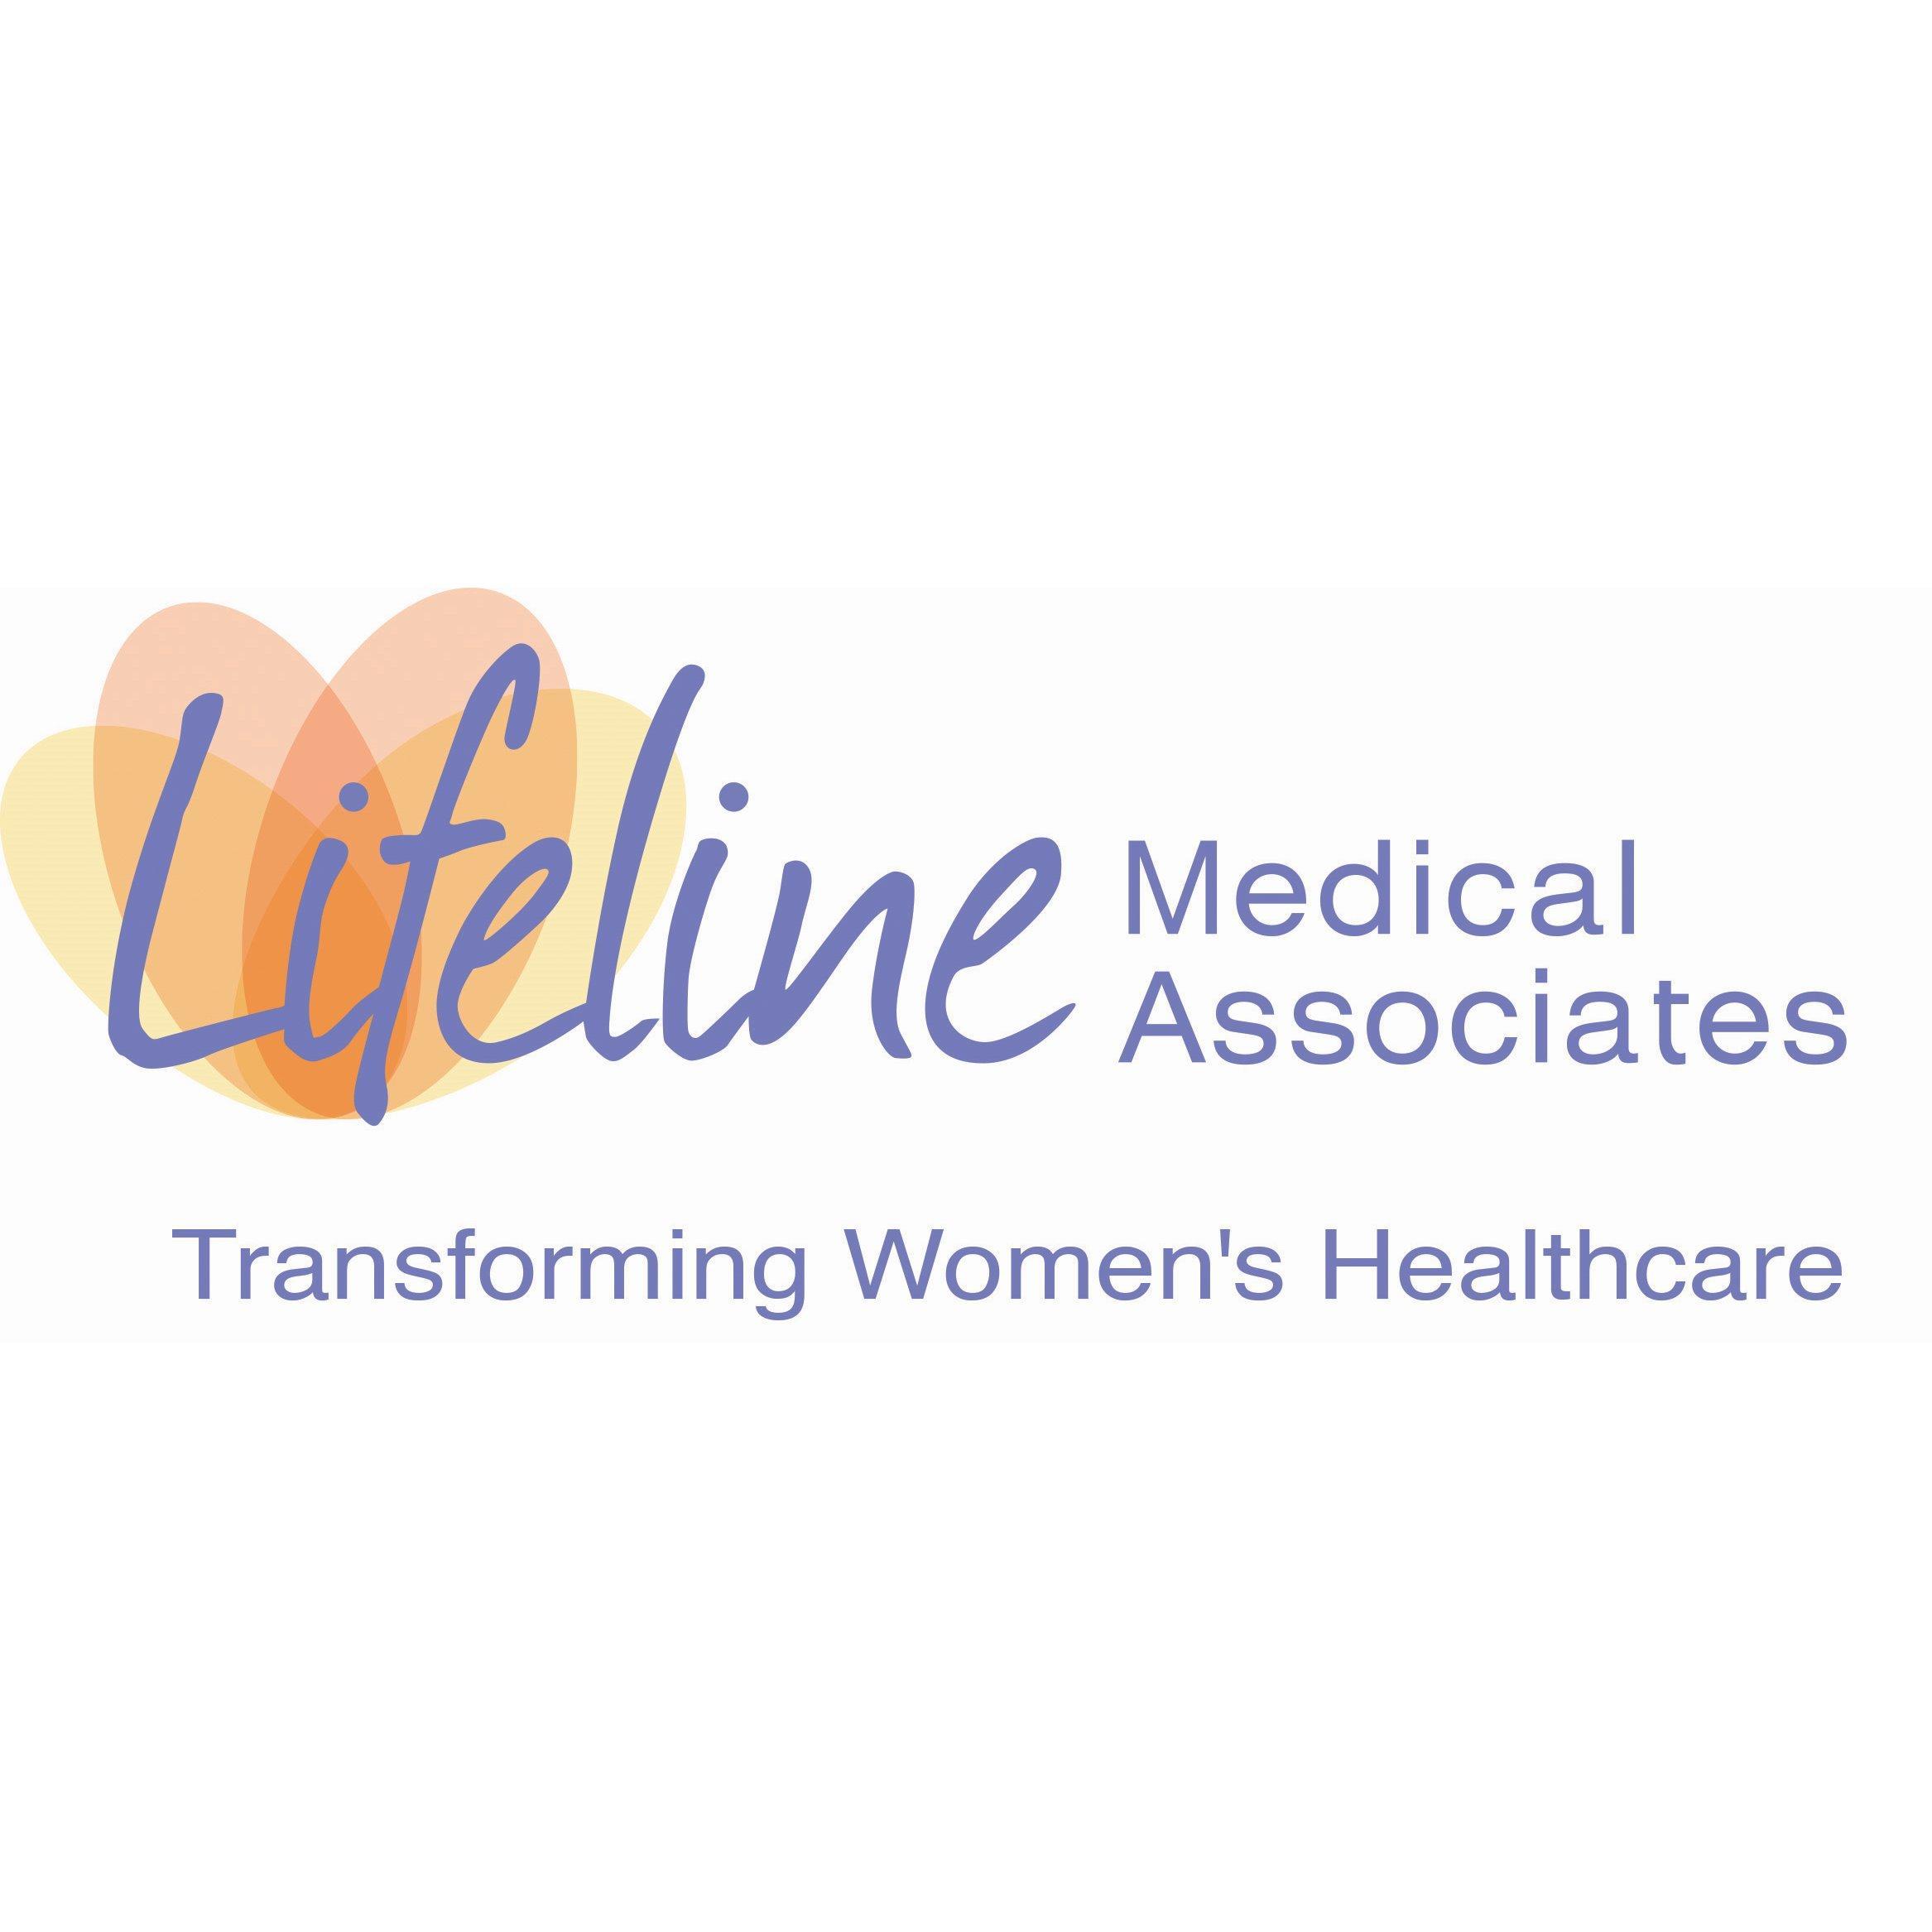 The Center for Women's Health